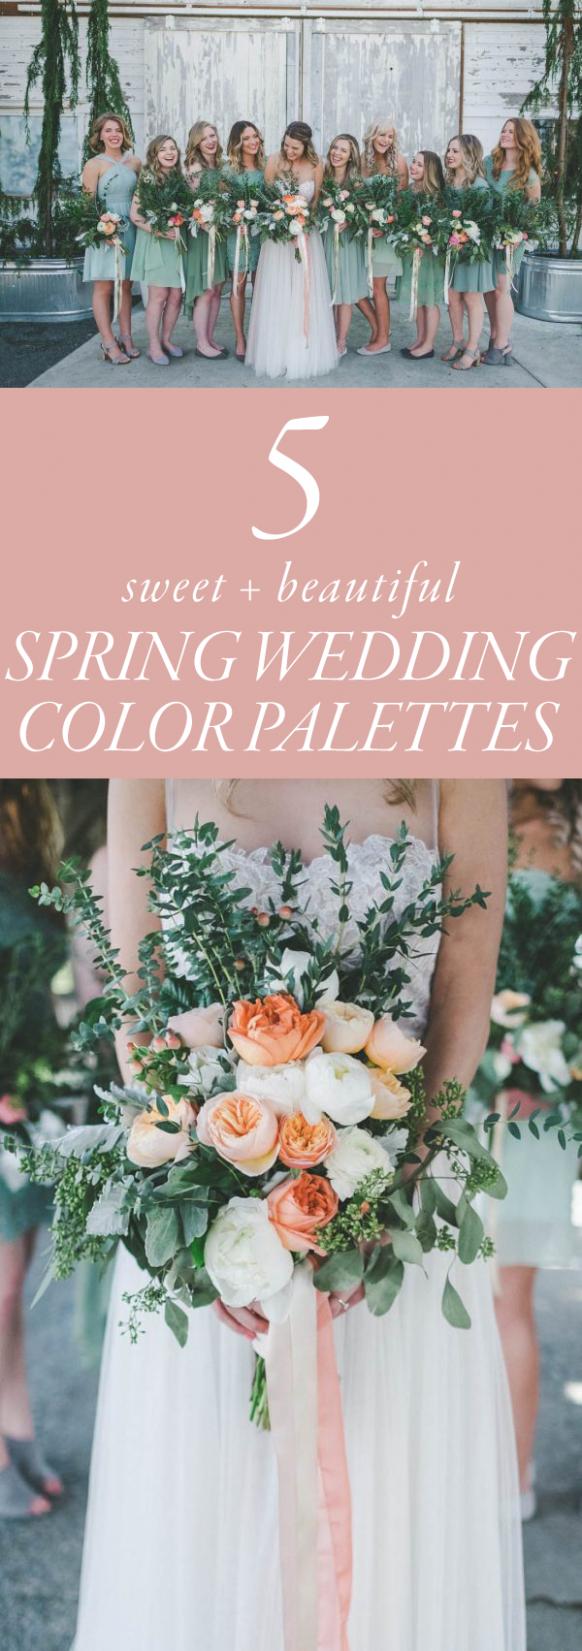 Wedding ideas spring  Spring Wedding Ideas Colour Palettes  Wedding Ideas  Pinterest